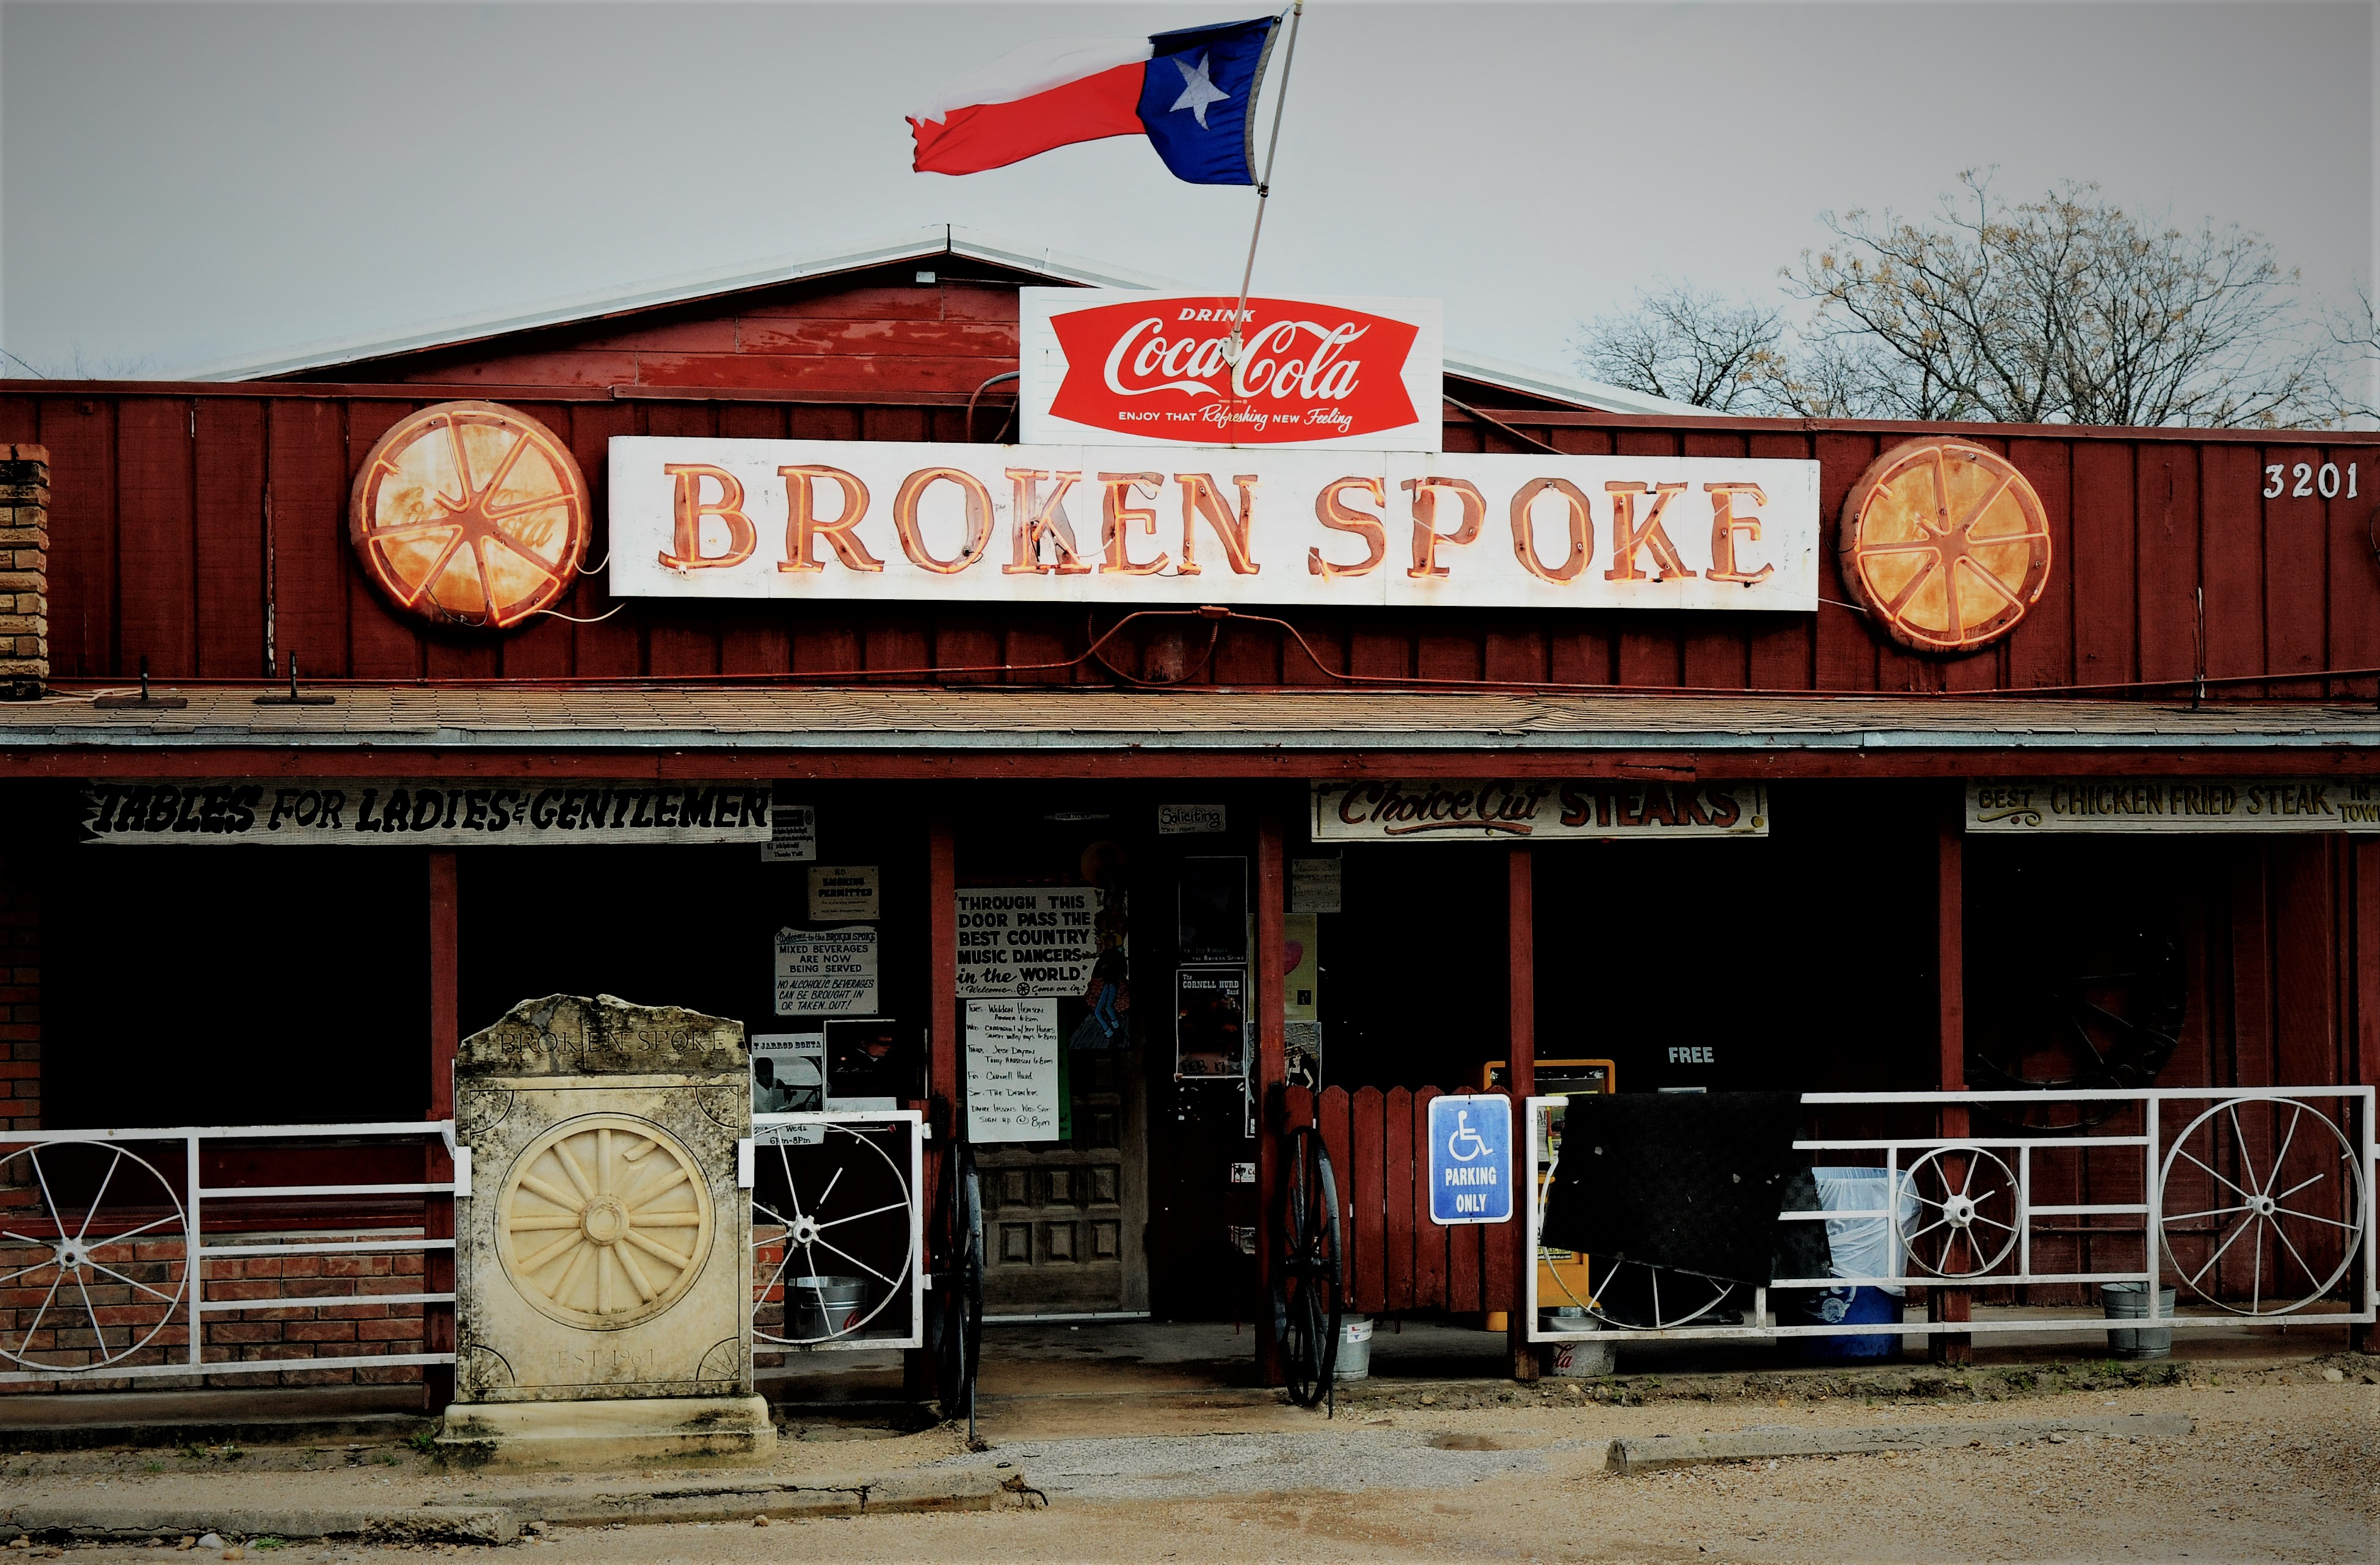 The Broken Spoke in Austin, Tx.